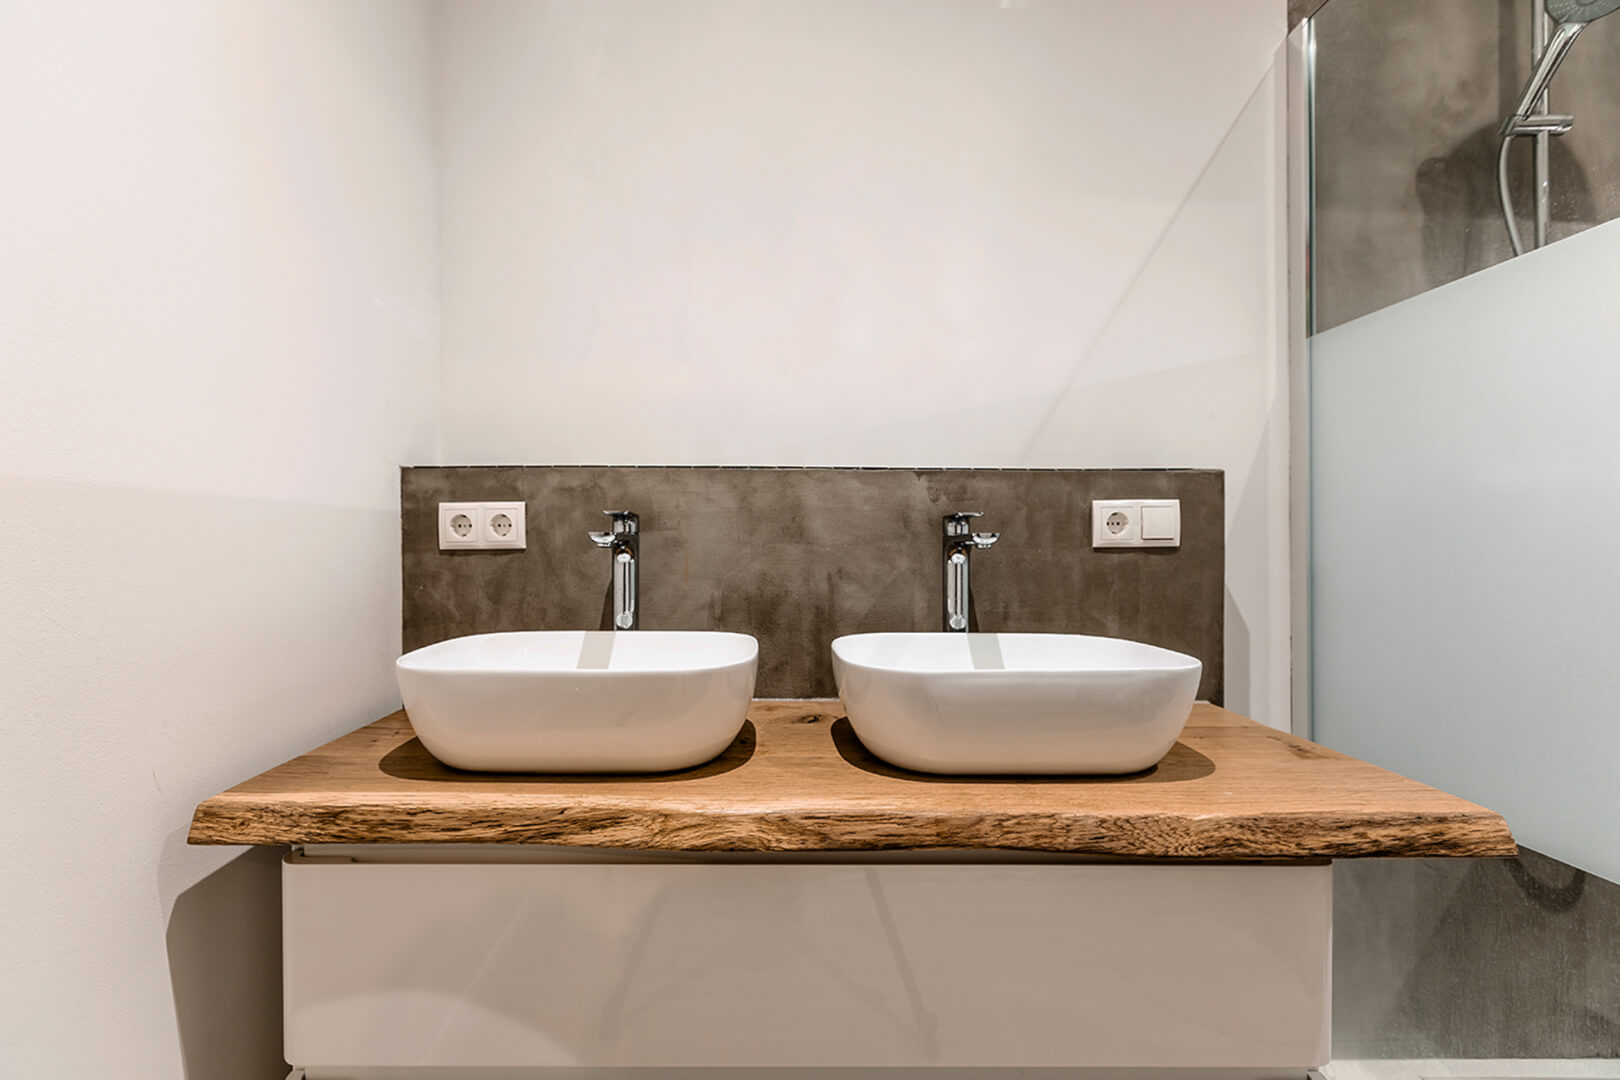 Waschtisch | Waschtischplatte | Massivholz